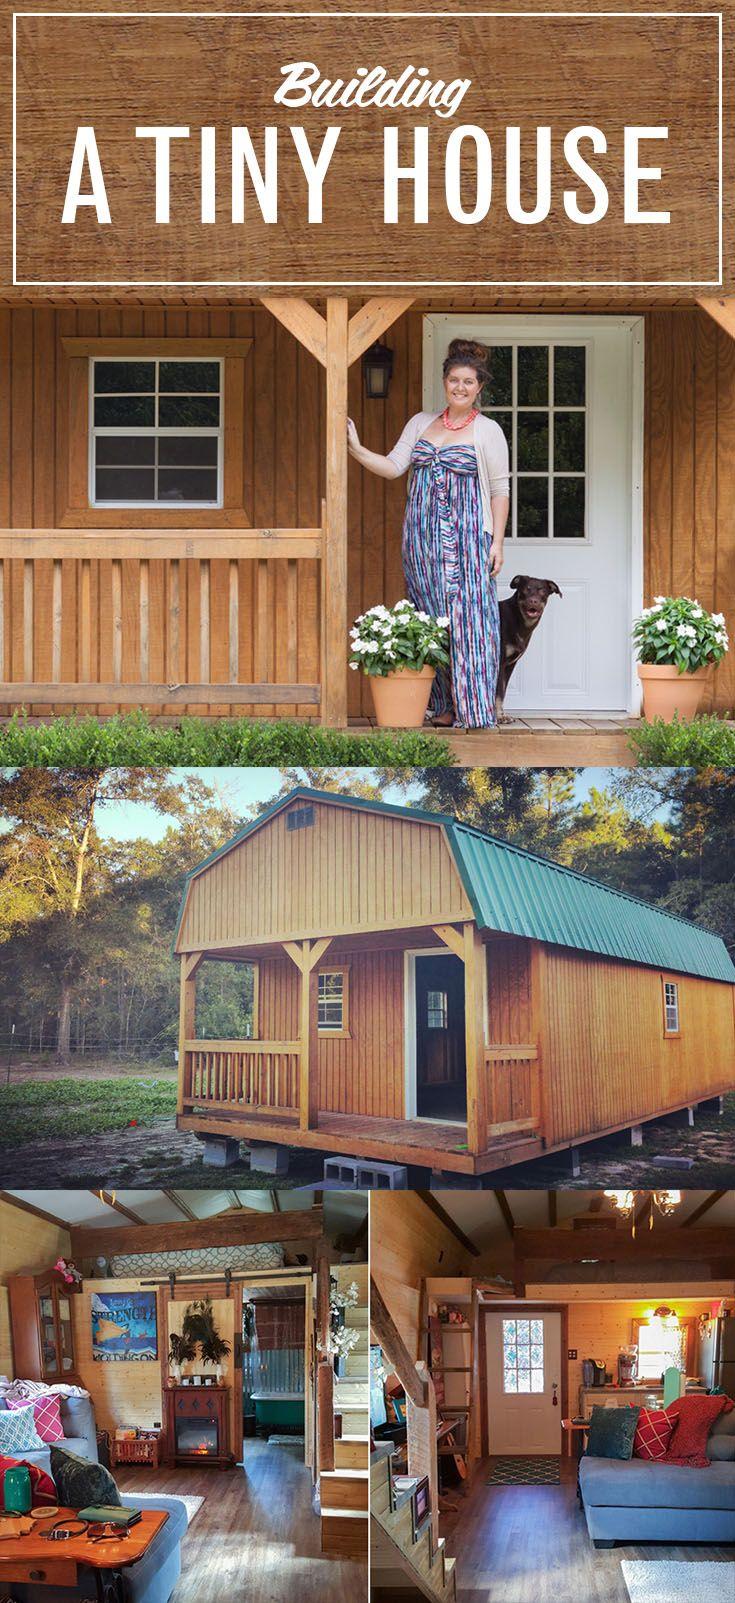 best 25 big homes ideas on pinterest big houses big houses one woman built a tiny house to heal a big heartbreak